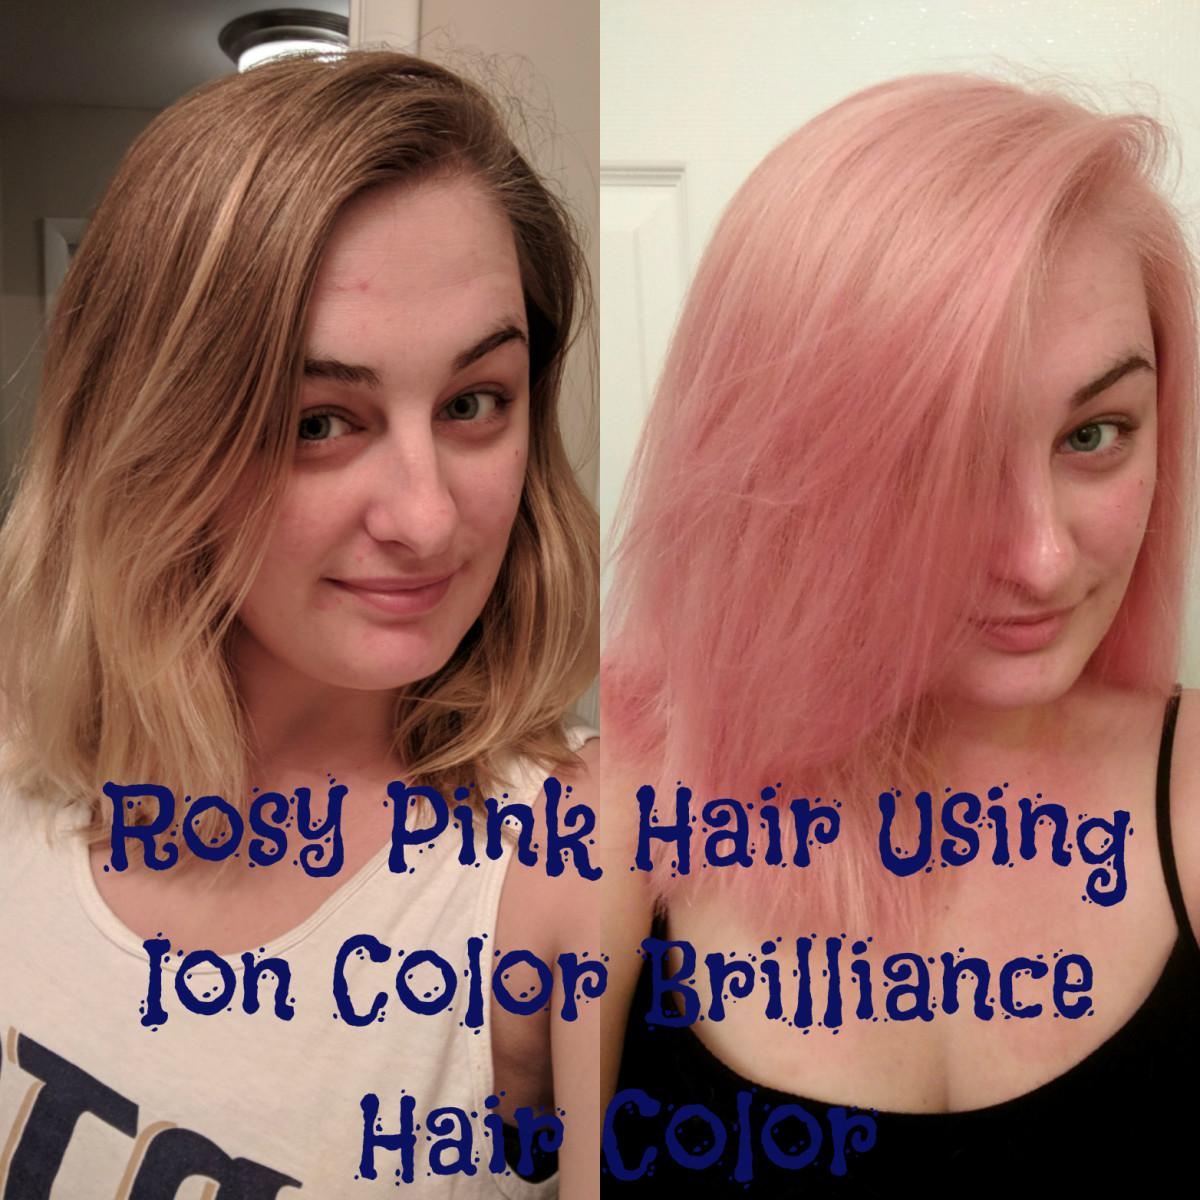 Hair DIY: How to Get Rose Quartz Hair Using Ion Color ...